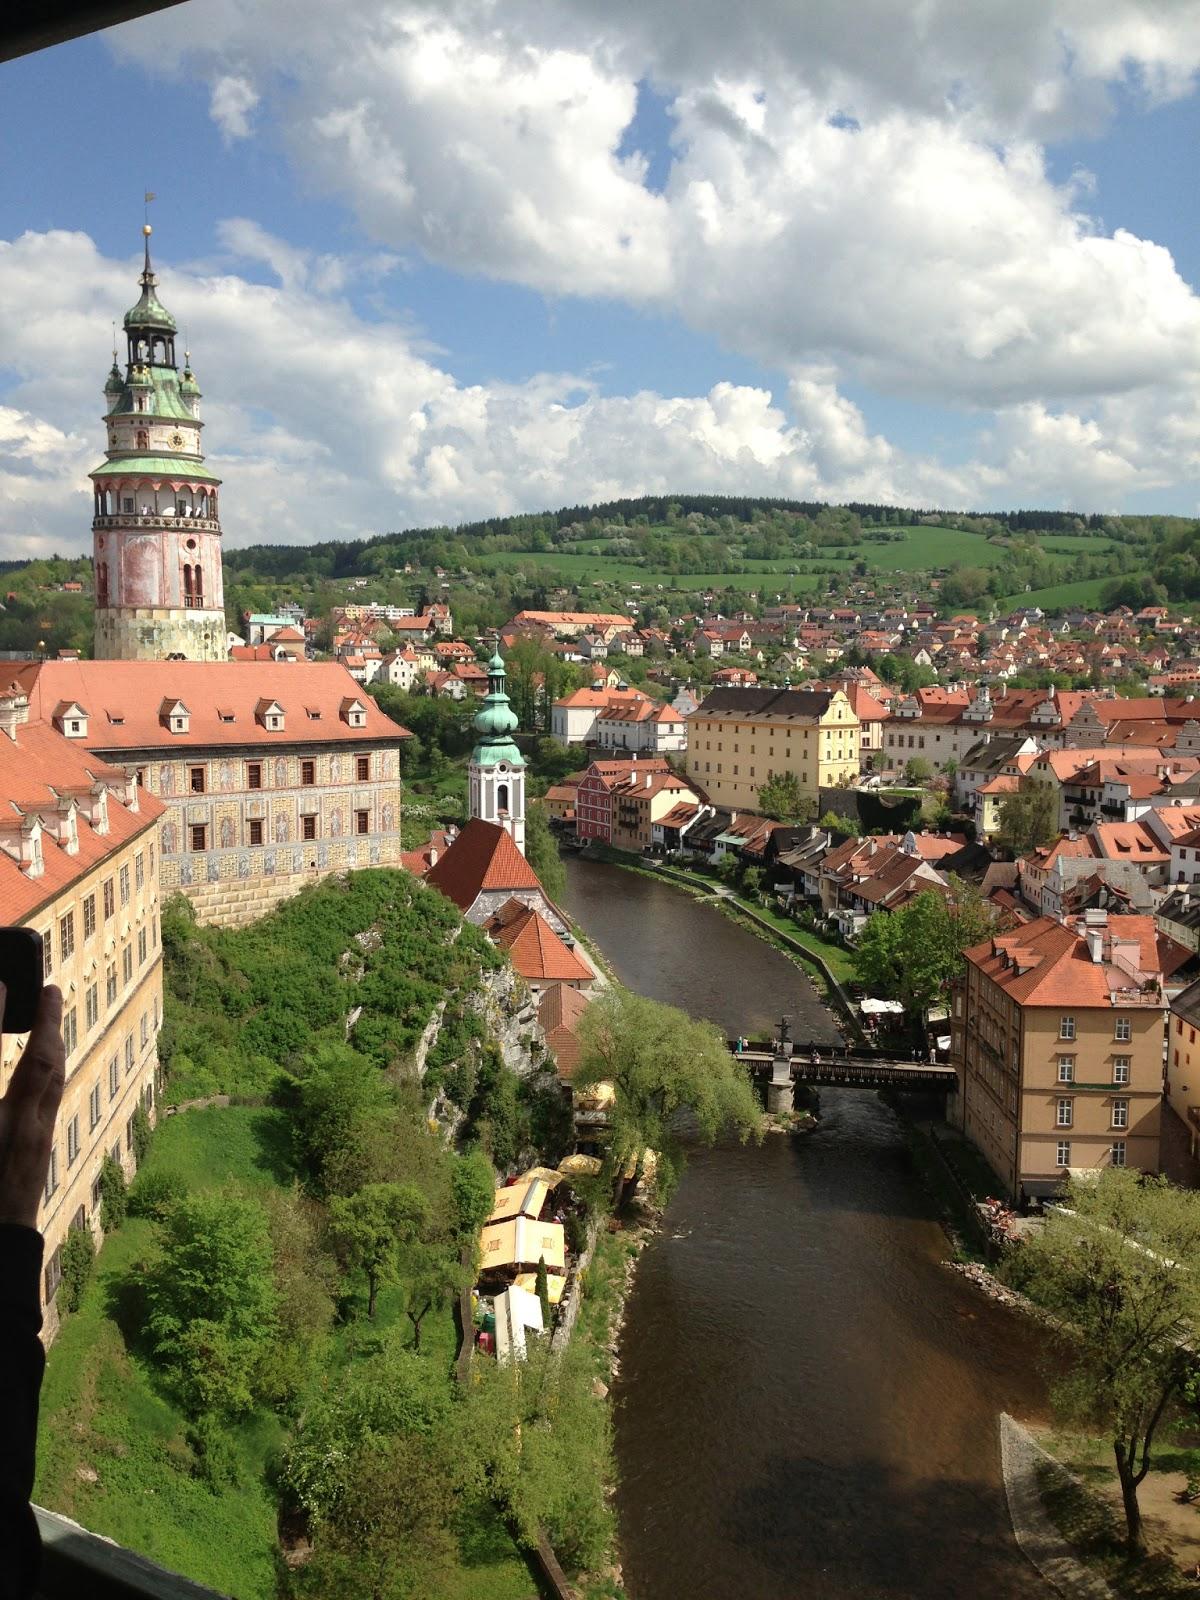 Cesky Krumlov Czech Republic  City pictures : ... Want and Desire: Clear Water Sample: Cesky Krumlov, Czech Republic